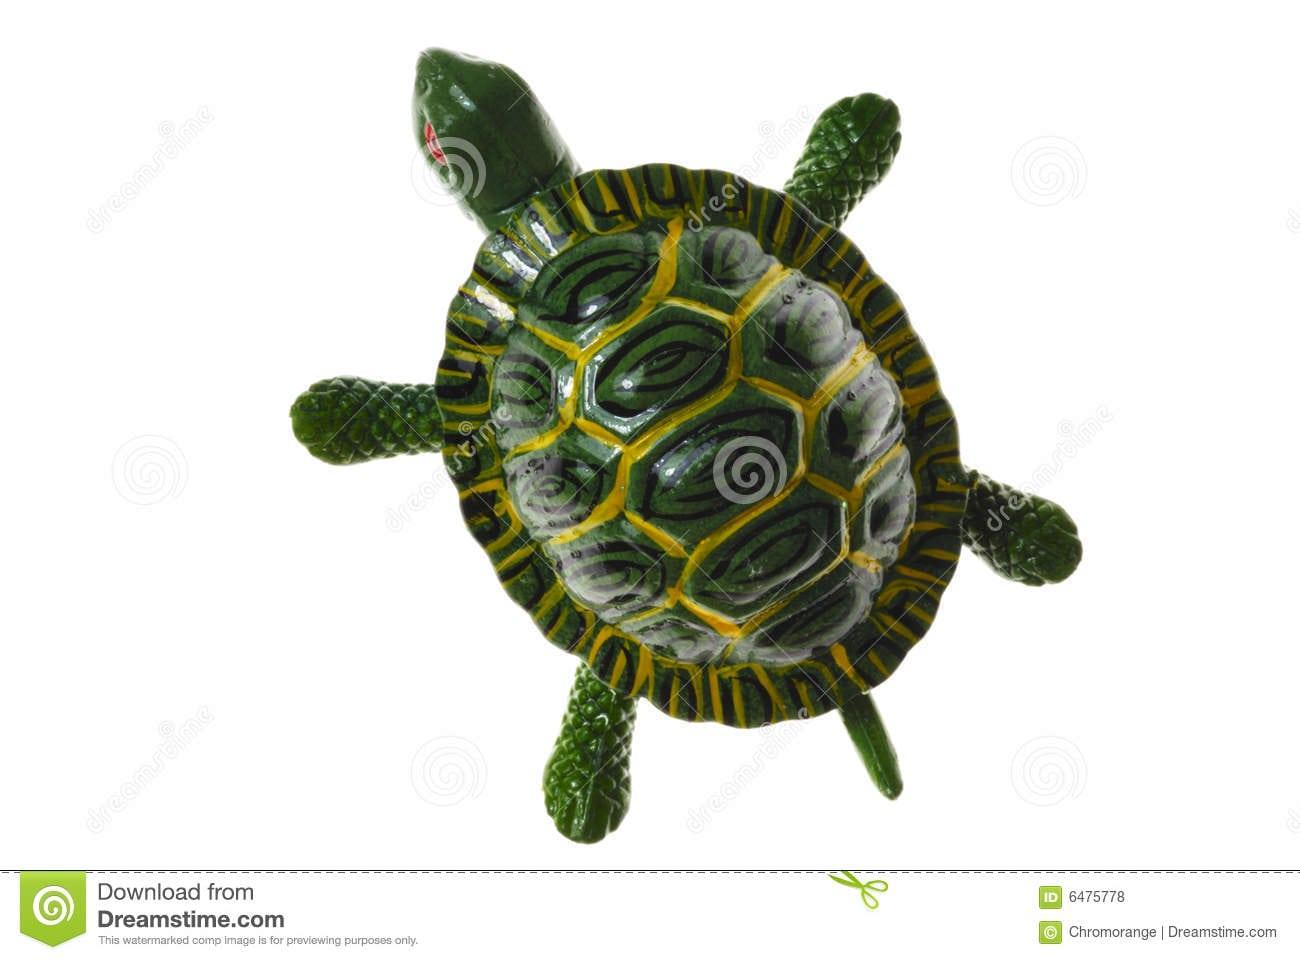 Figura Da Tartaruga Foto De Stock  Imagem De Isolado, Imitation